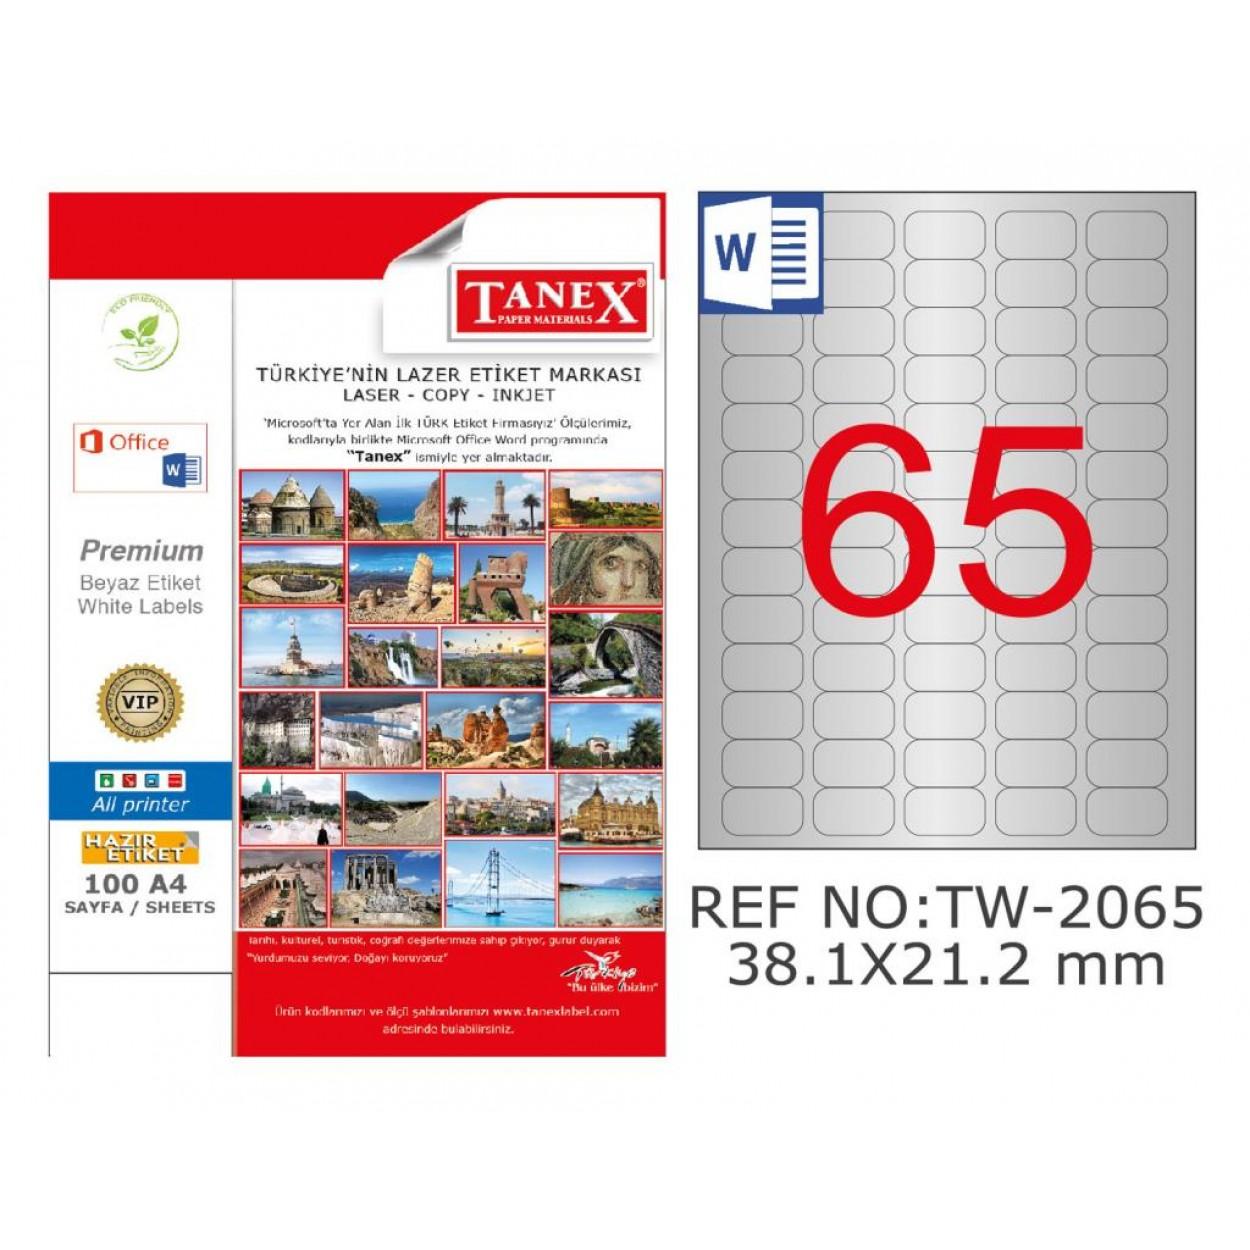 Tanex TW-2065 38.1x21.2mm Gümüş Lazer Etiket 1625 Li